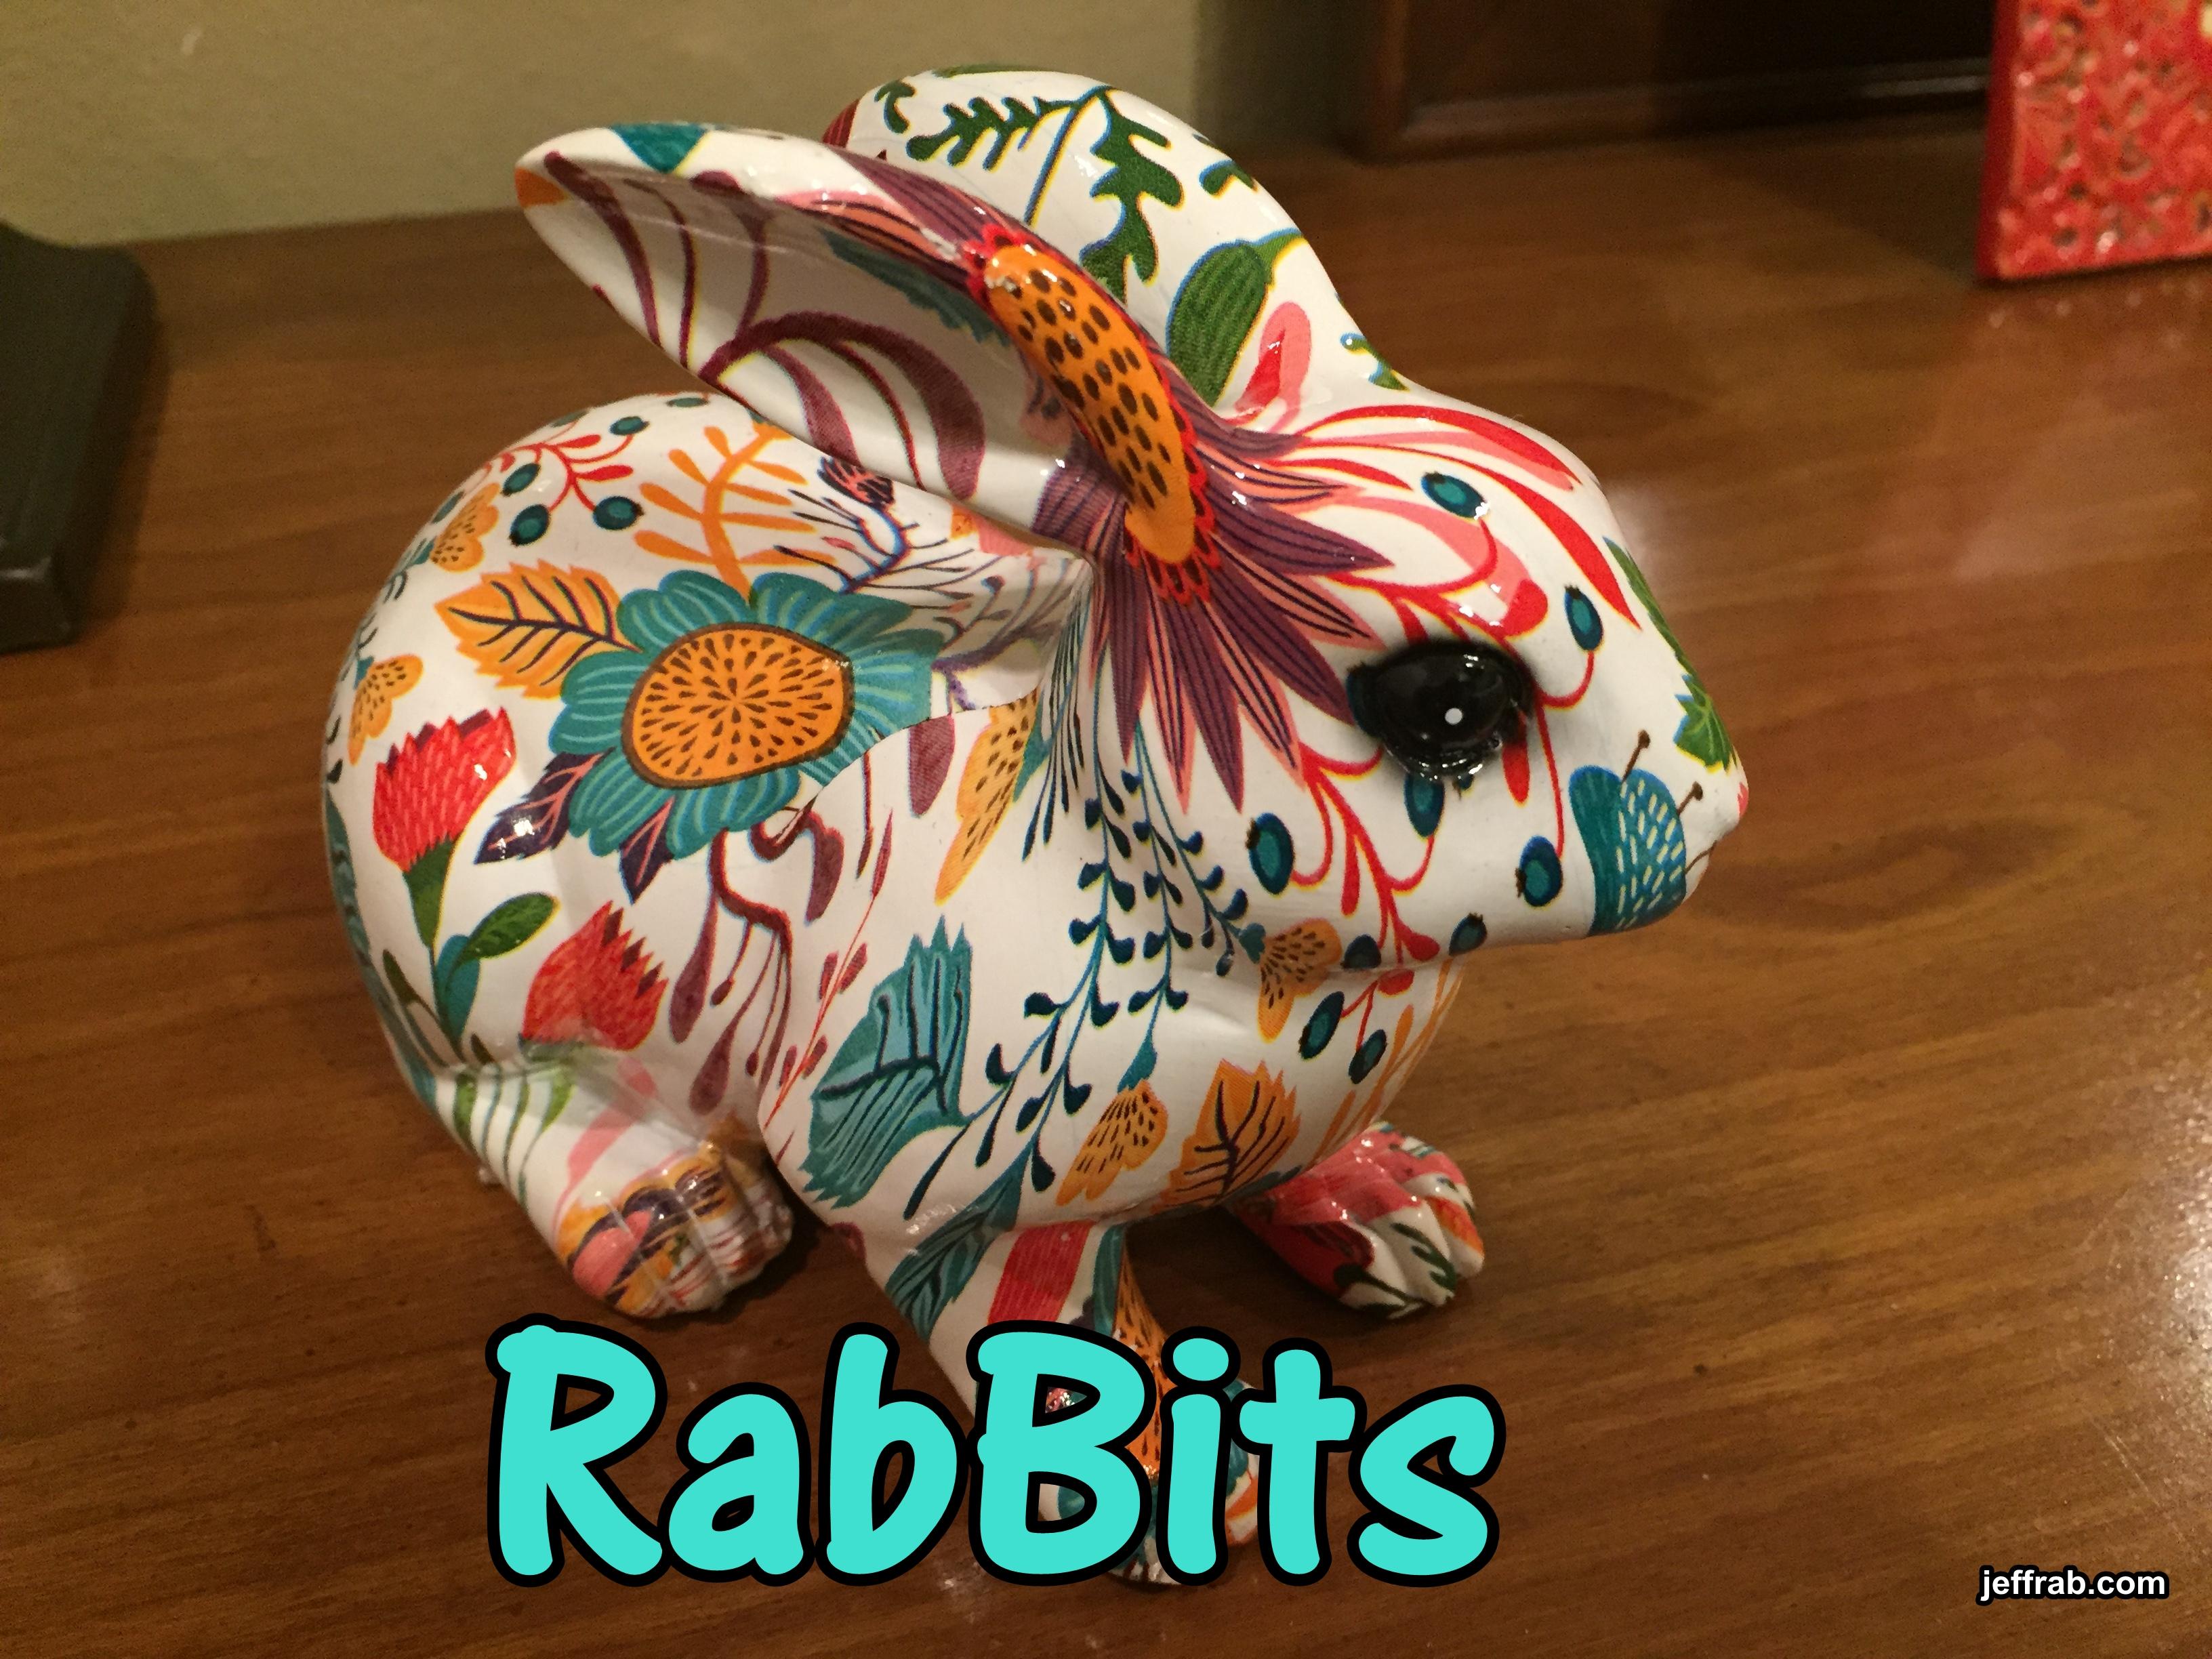 RabBits 5